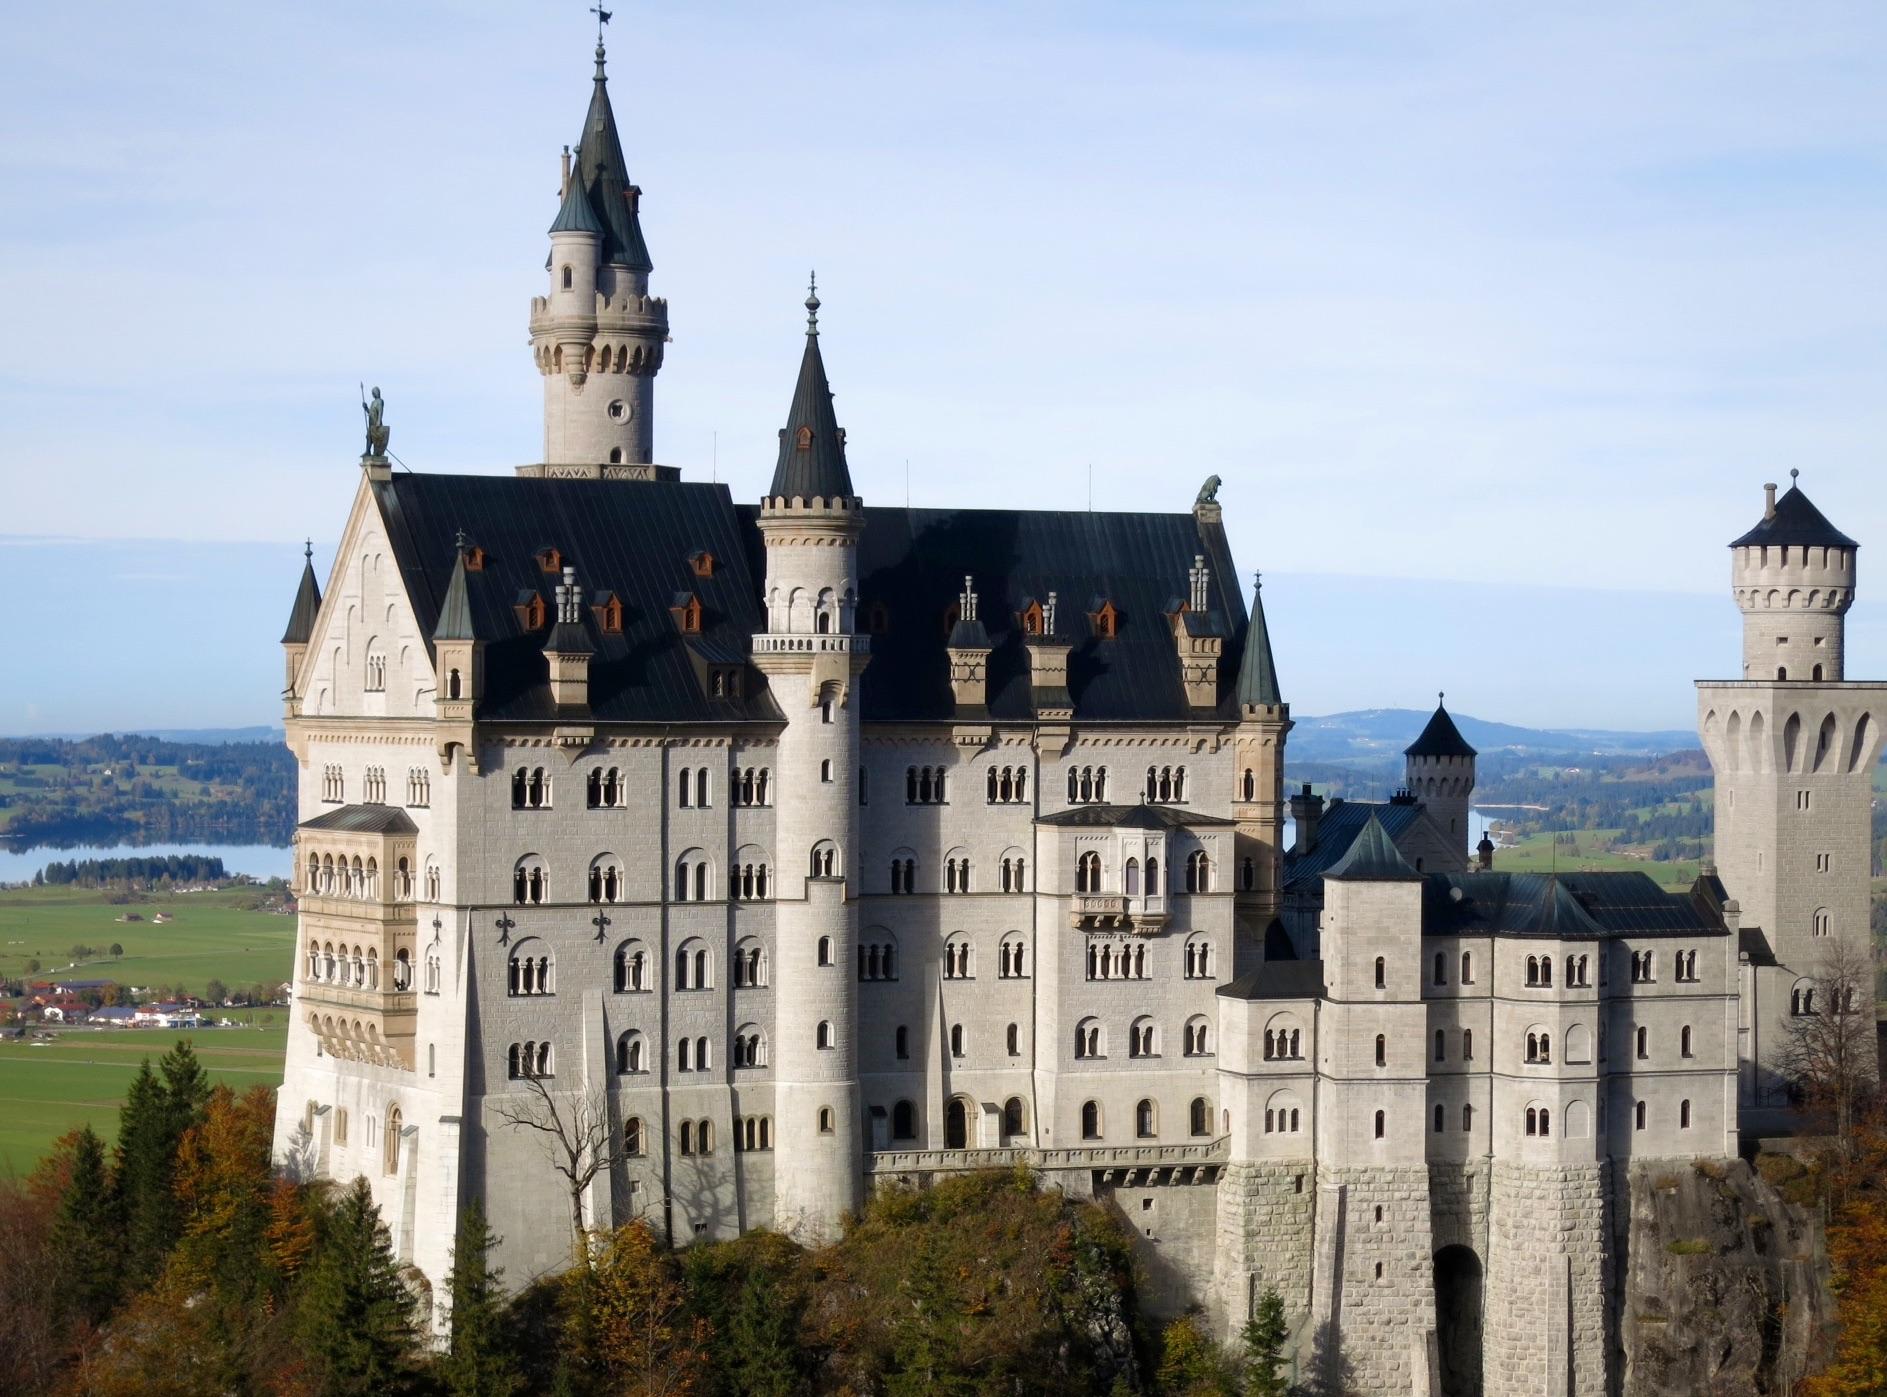 Ludwig's Fairytale Castle (Munich)